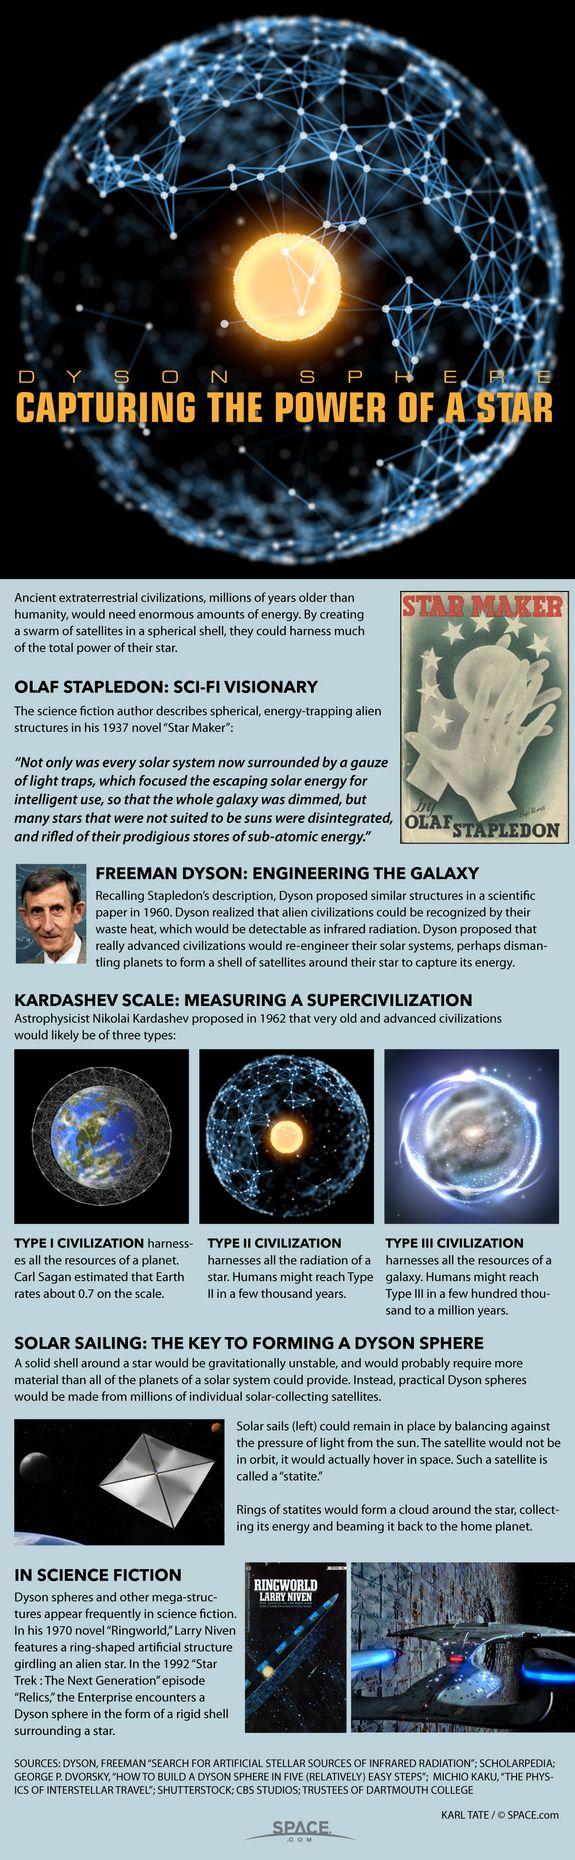 Dyson Spheres could provide power for advanced alien civilizations.